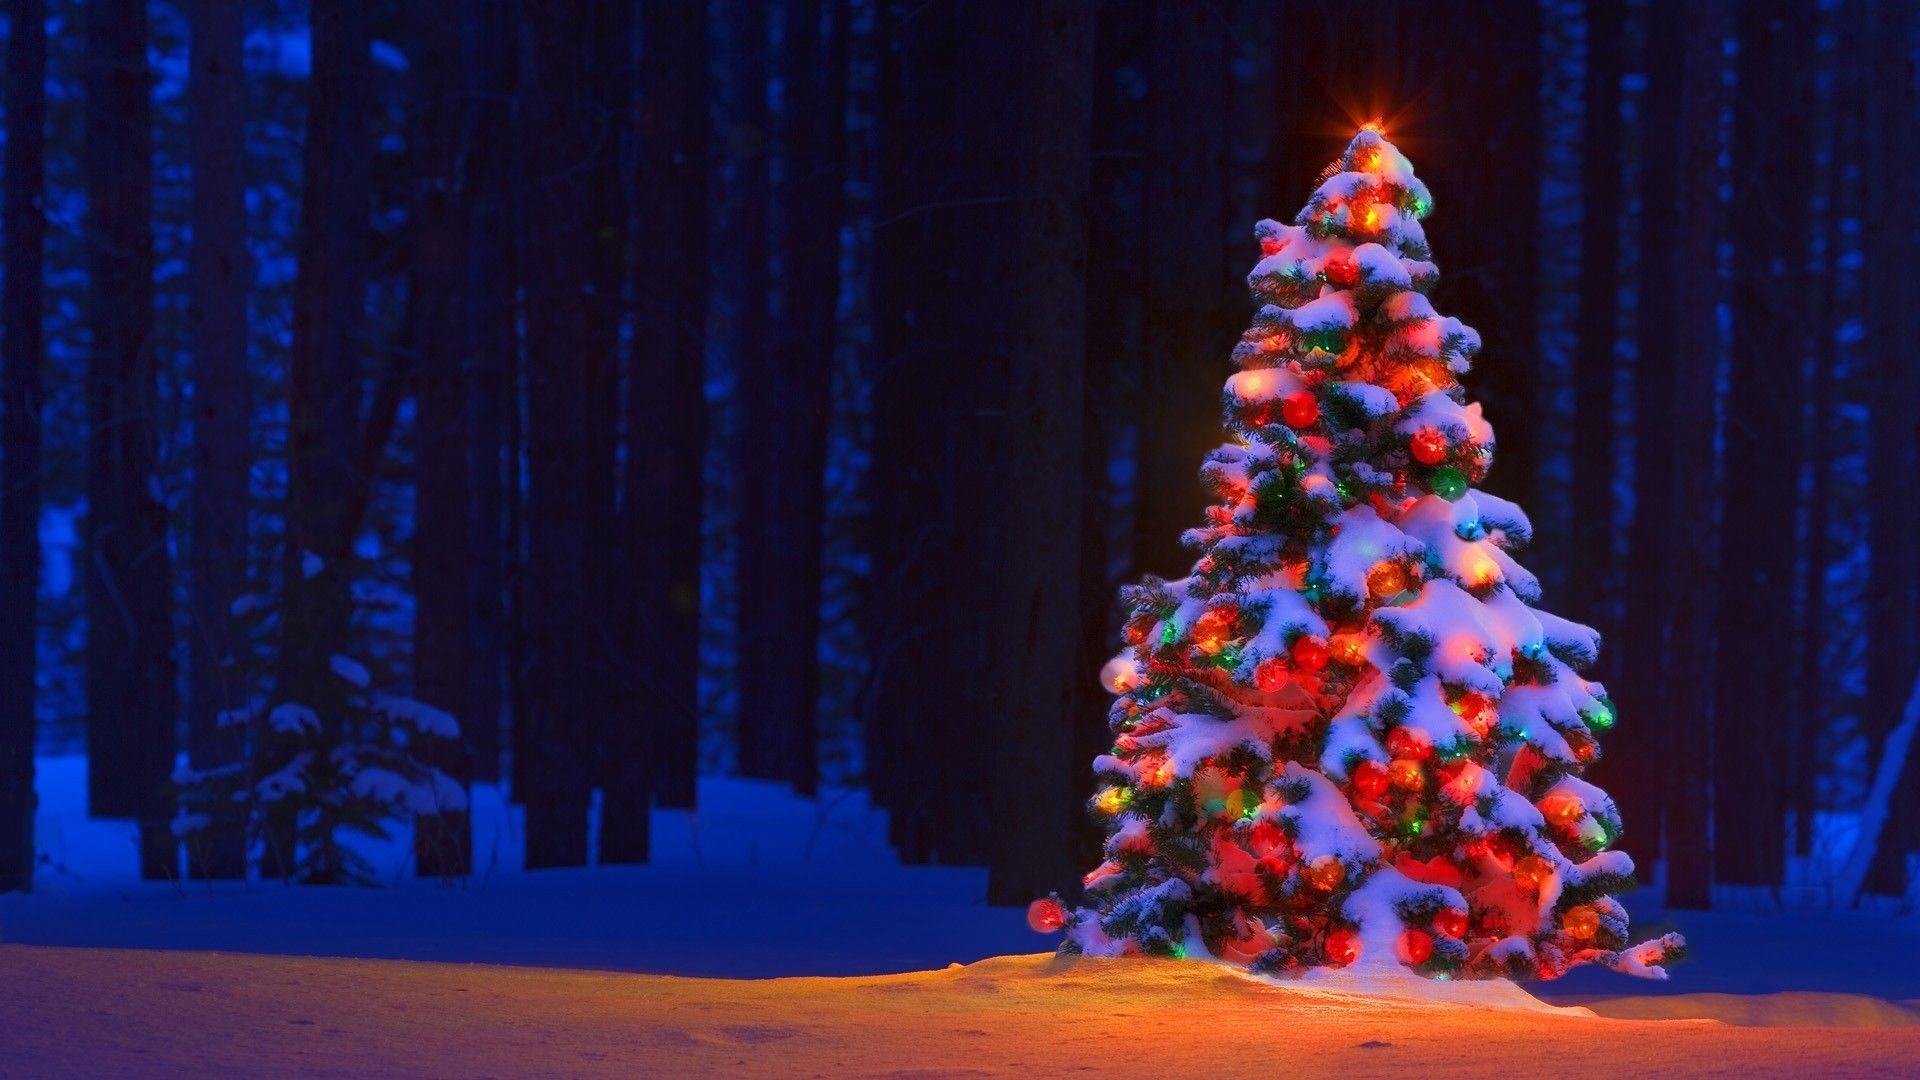 Марта картинки, картинки елка новогодняя на рабочий